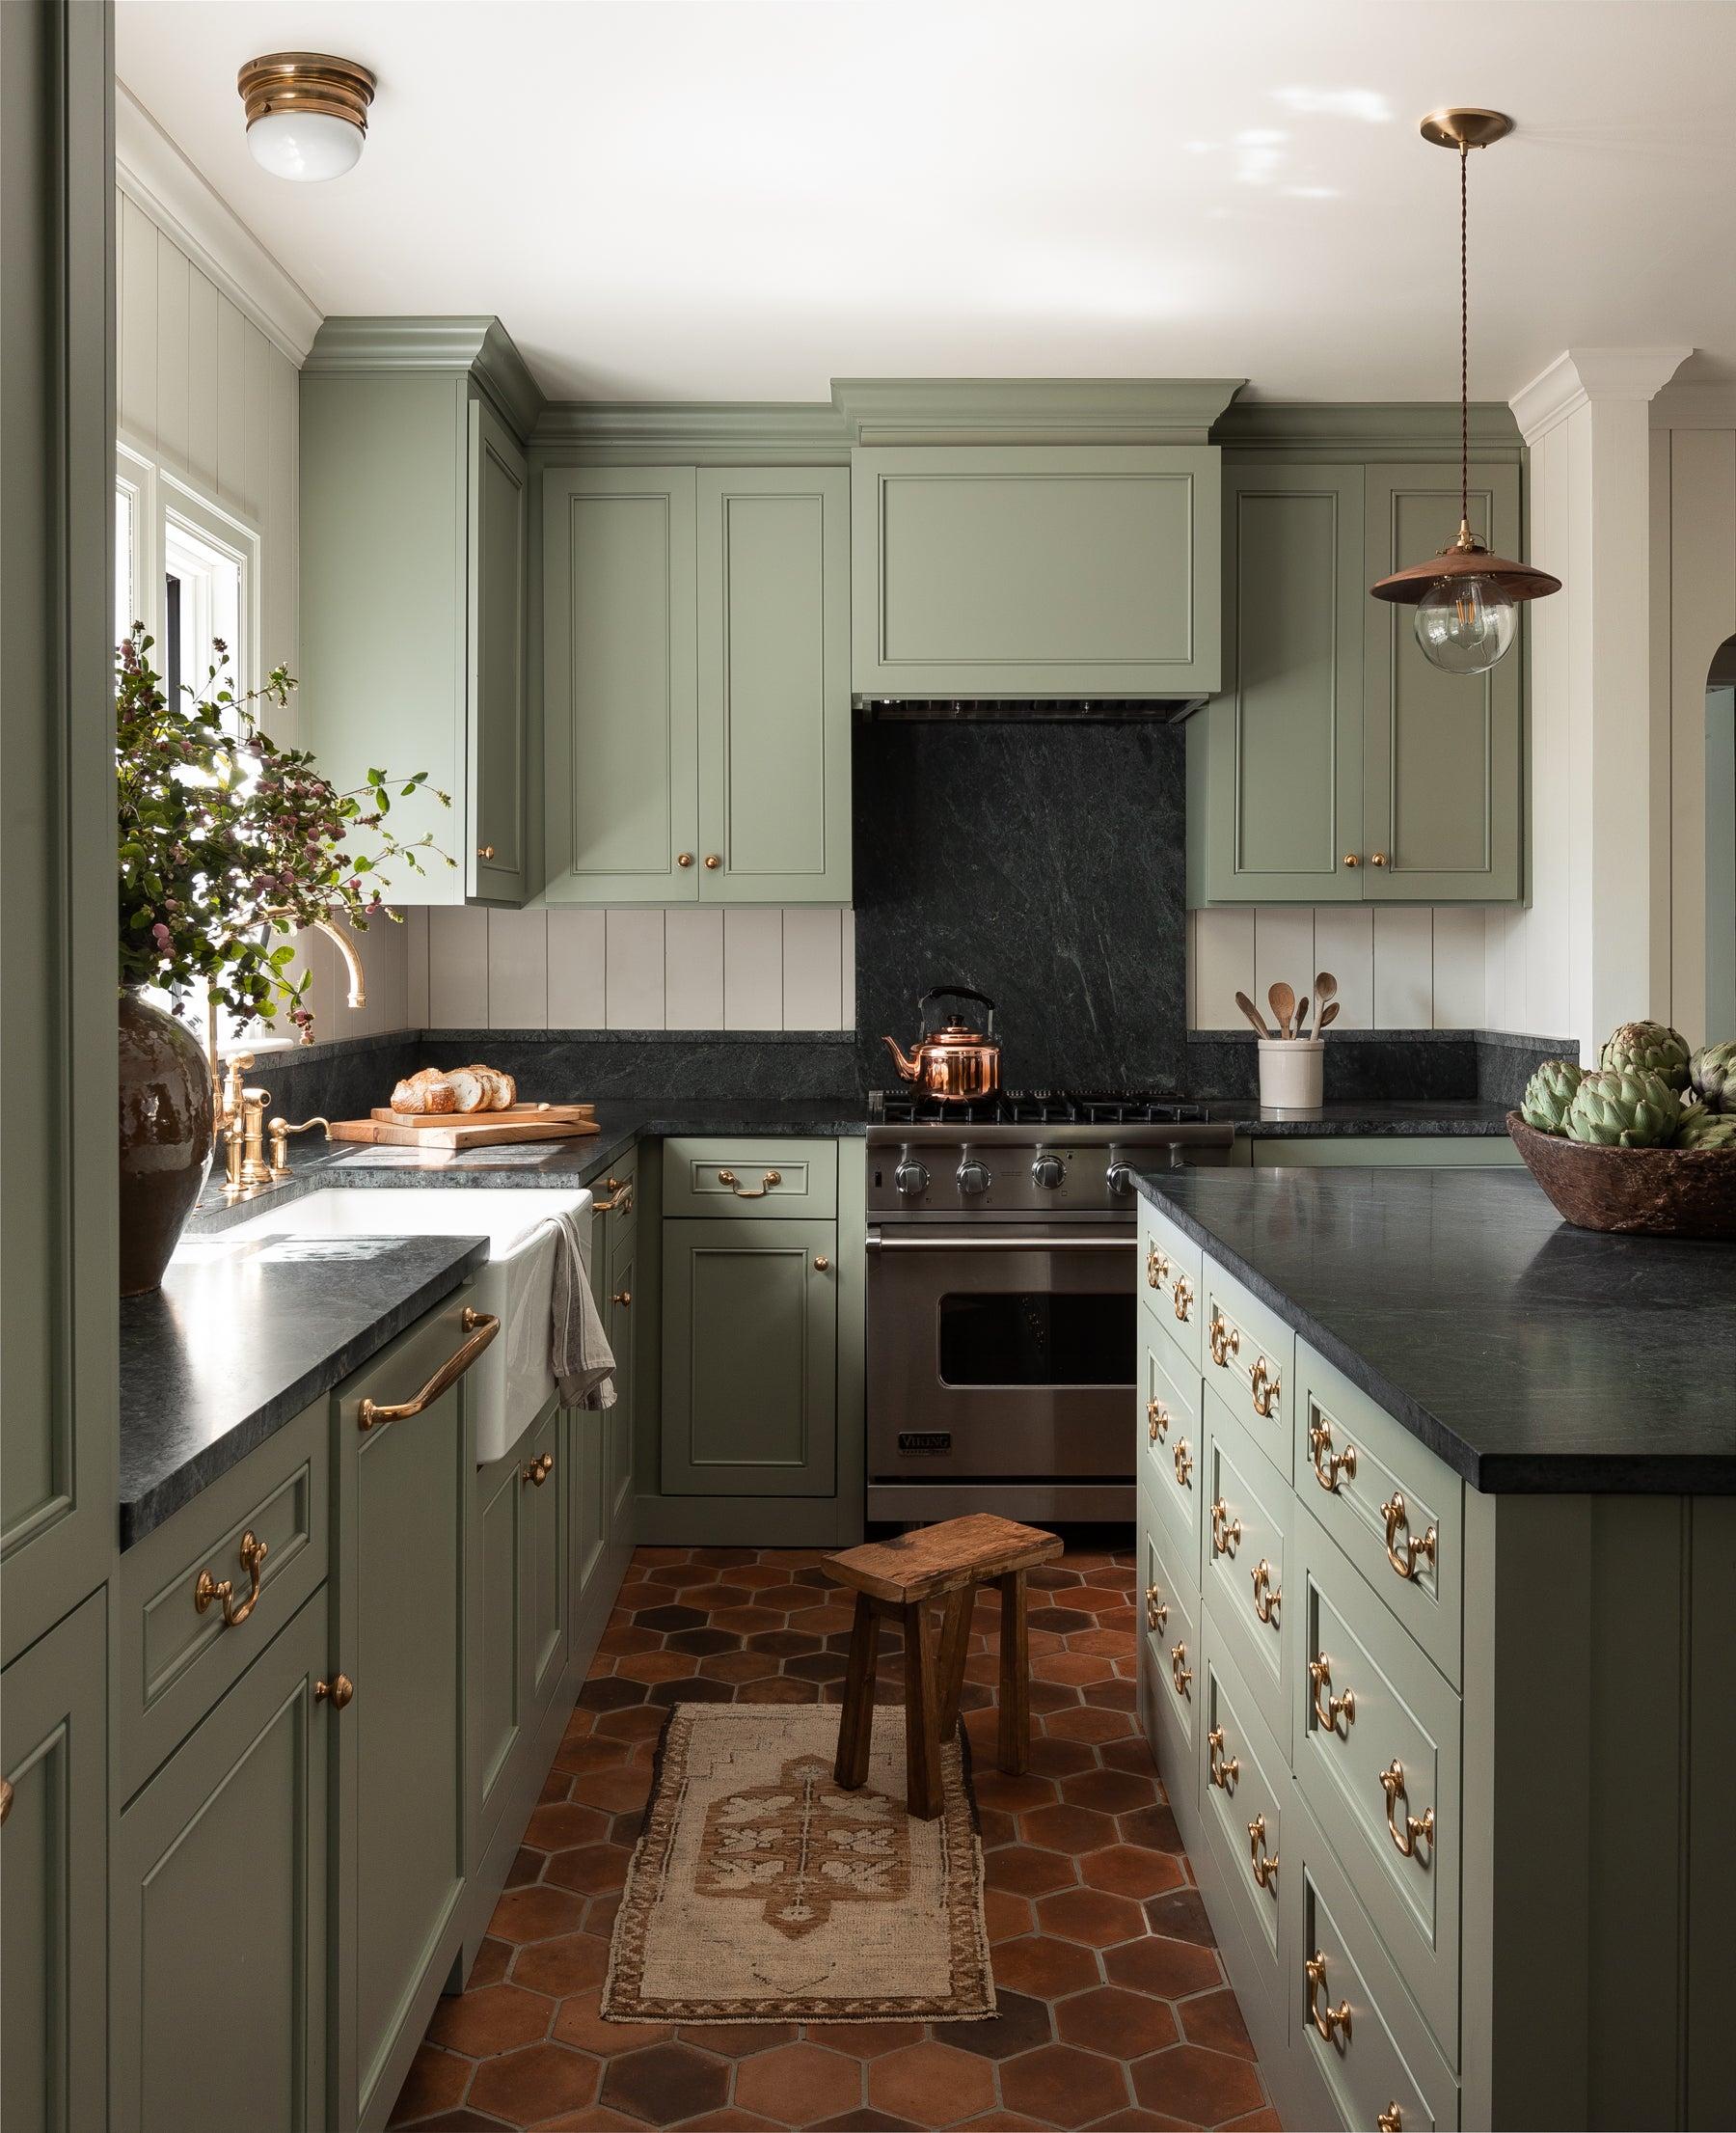 Heidi-Caillier-Design-Seattle-interior-designer-kitchen-green-cabinets-terracotta-floors-lantern-brass-cabinet-hardware-soapstone-countertops-shaker-cabinets-backsplash-farm-sink